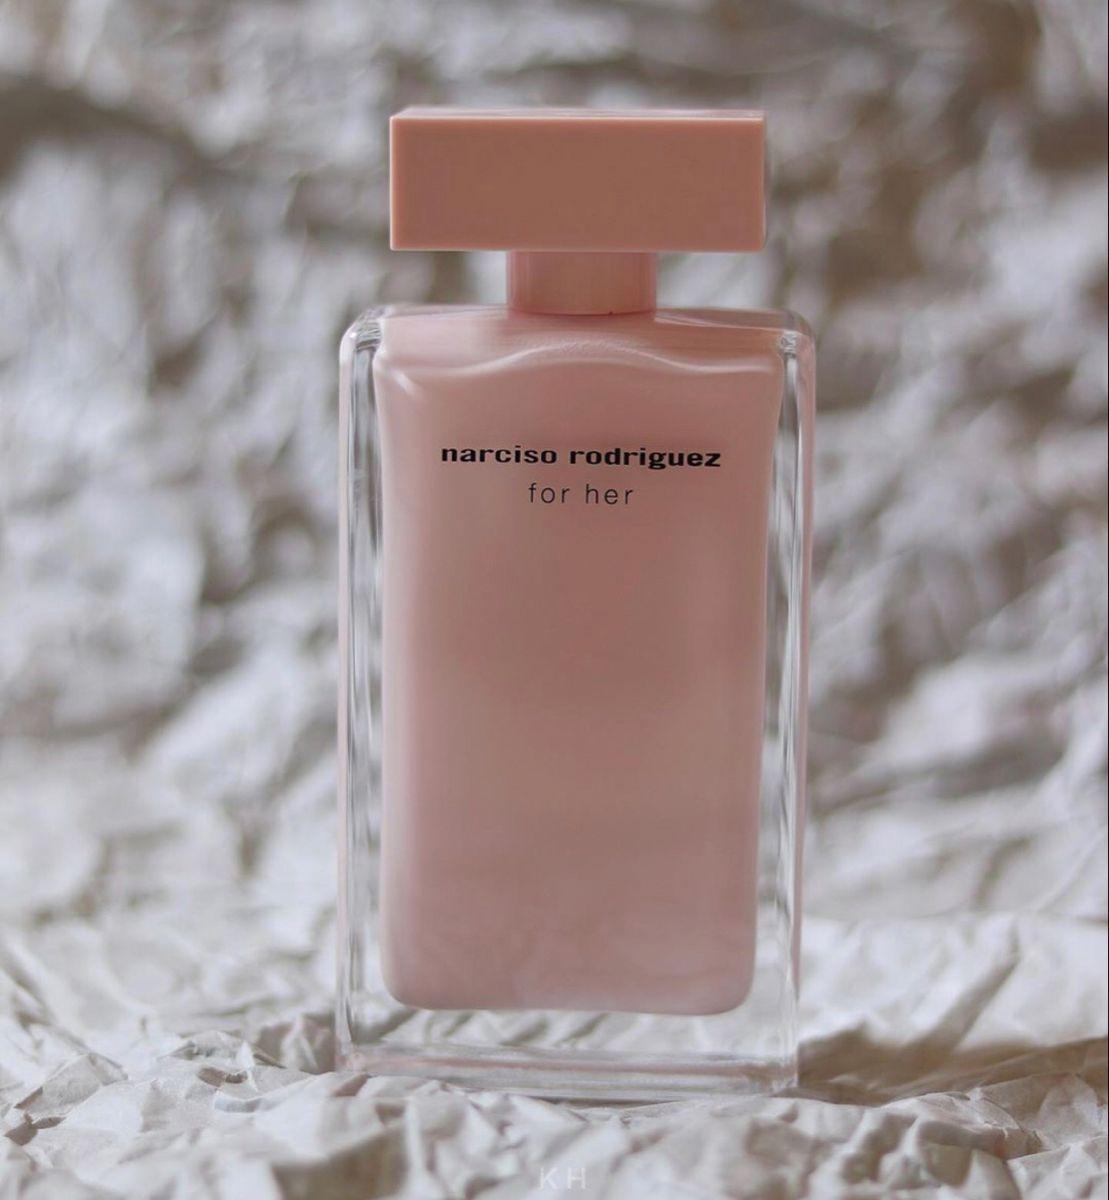 Narciso Rodriguez Narciso Rodriguez Eau De Parfum Perfume Bottles